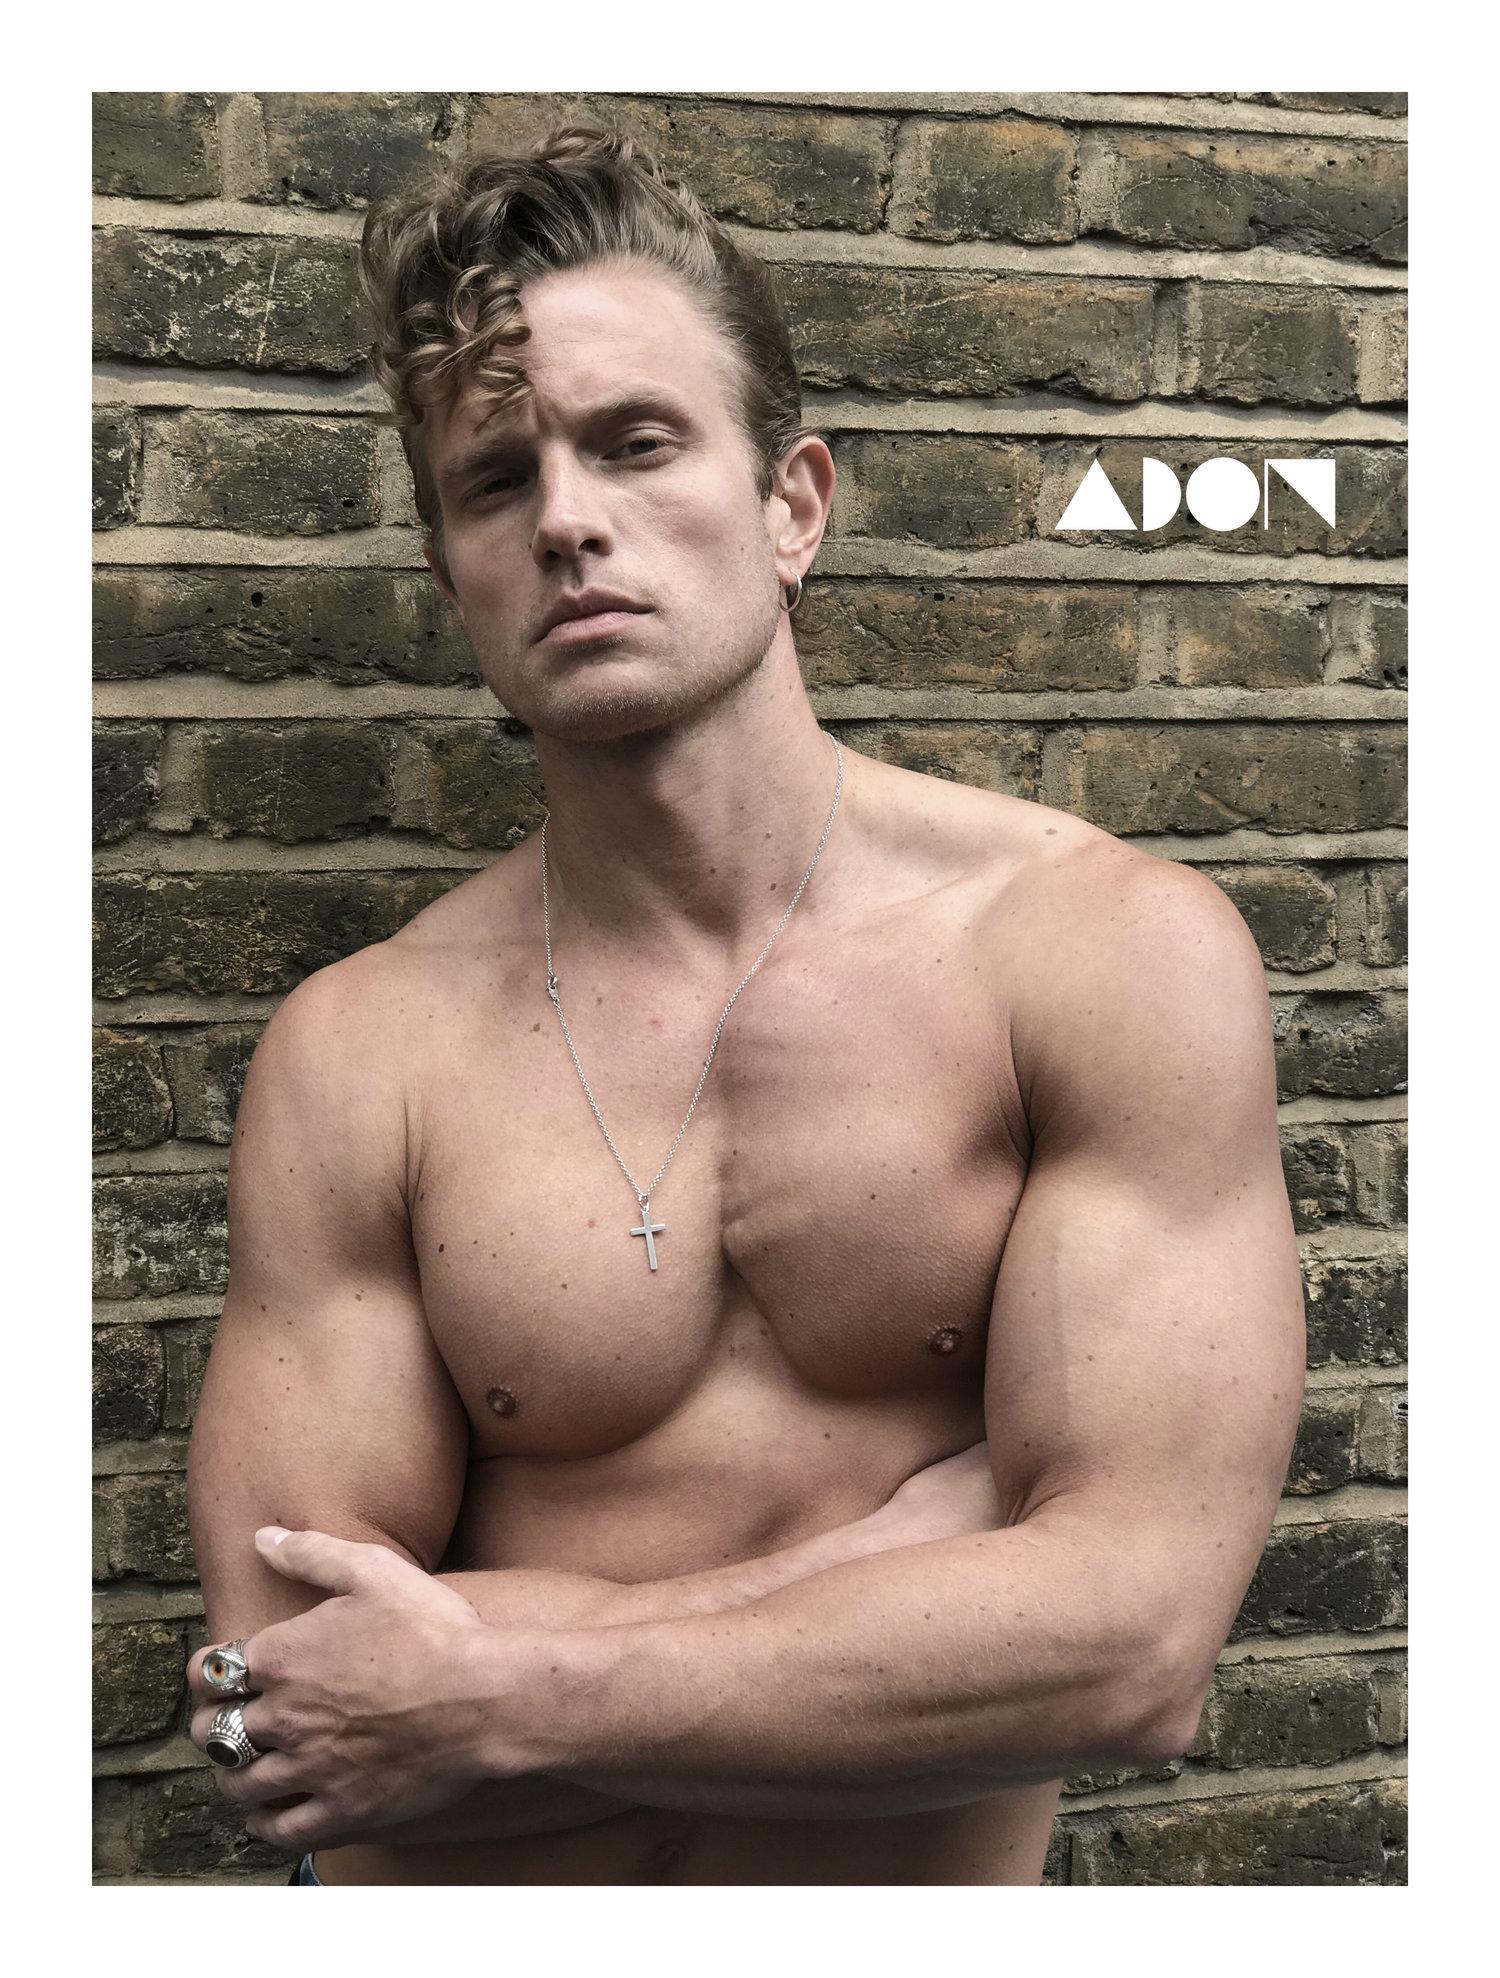 Adon Exclusive: Model Ollie Pearce By Graham Cruz